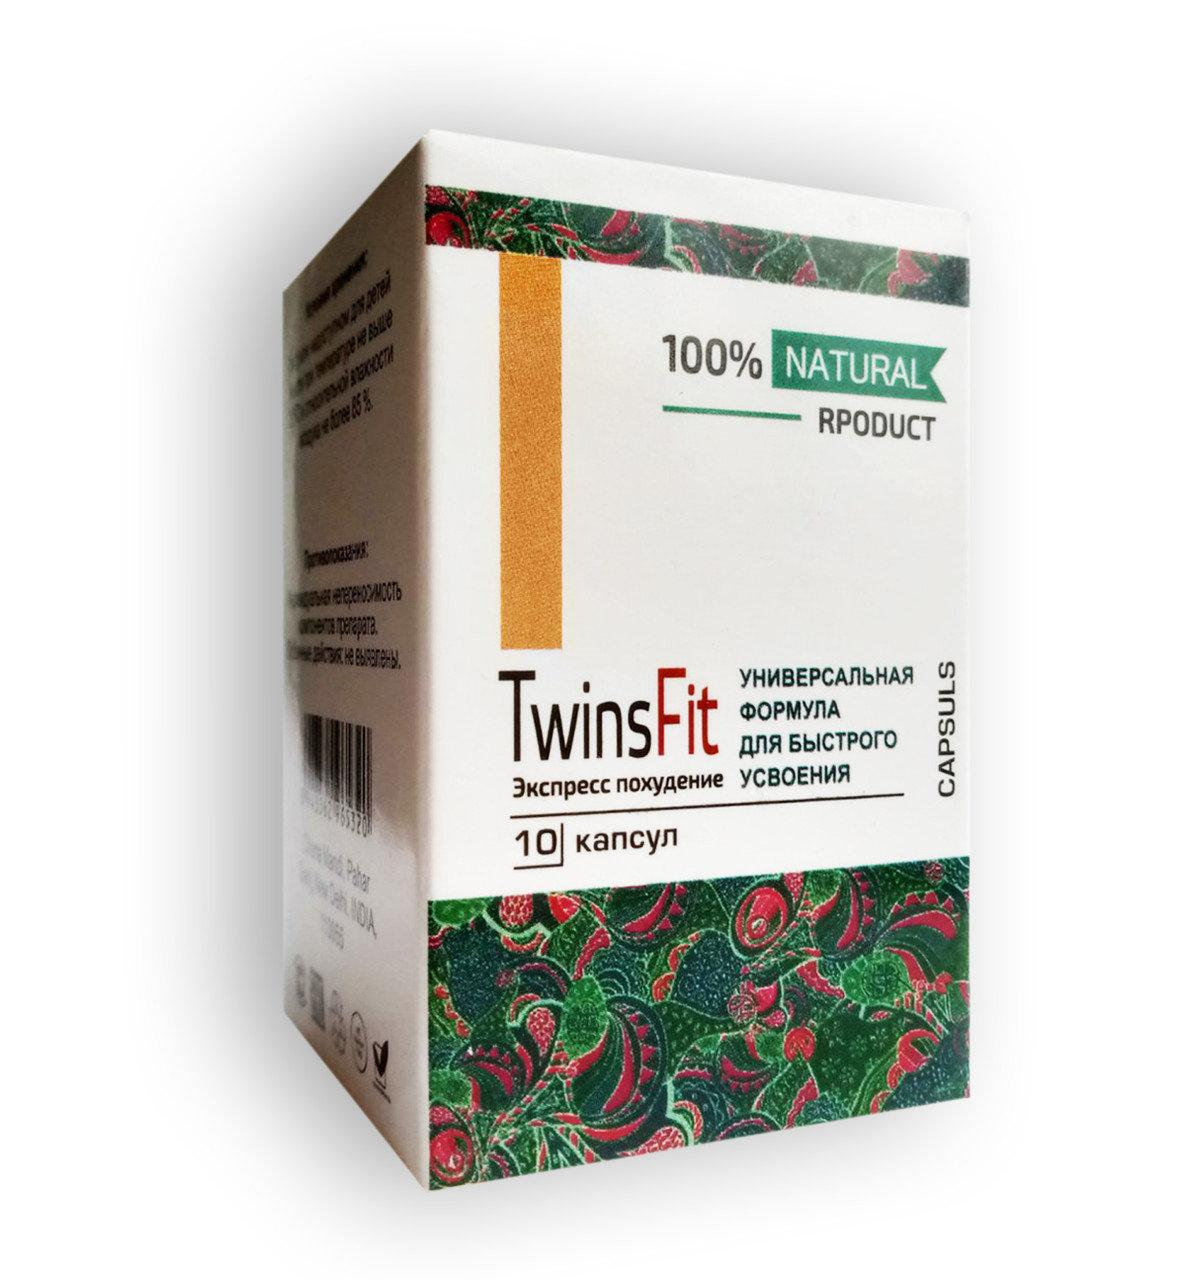 TwinsFit - капсули для схуднення (ТвинсФит)